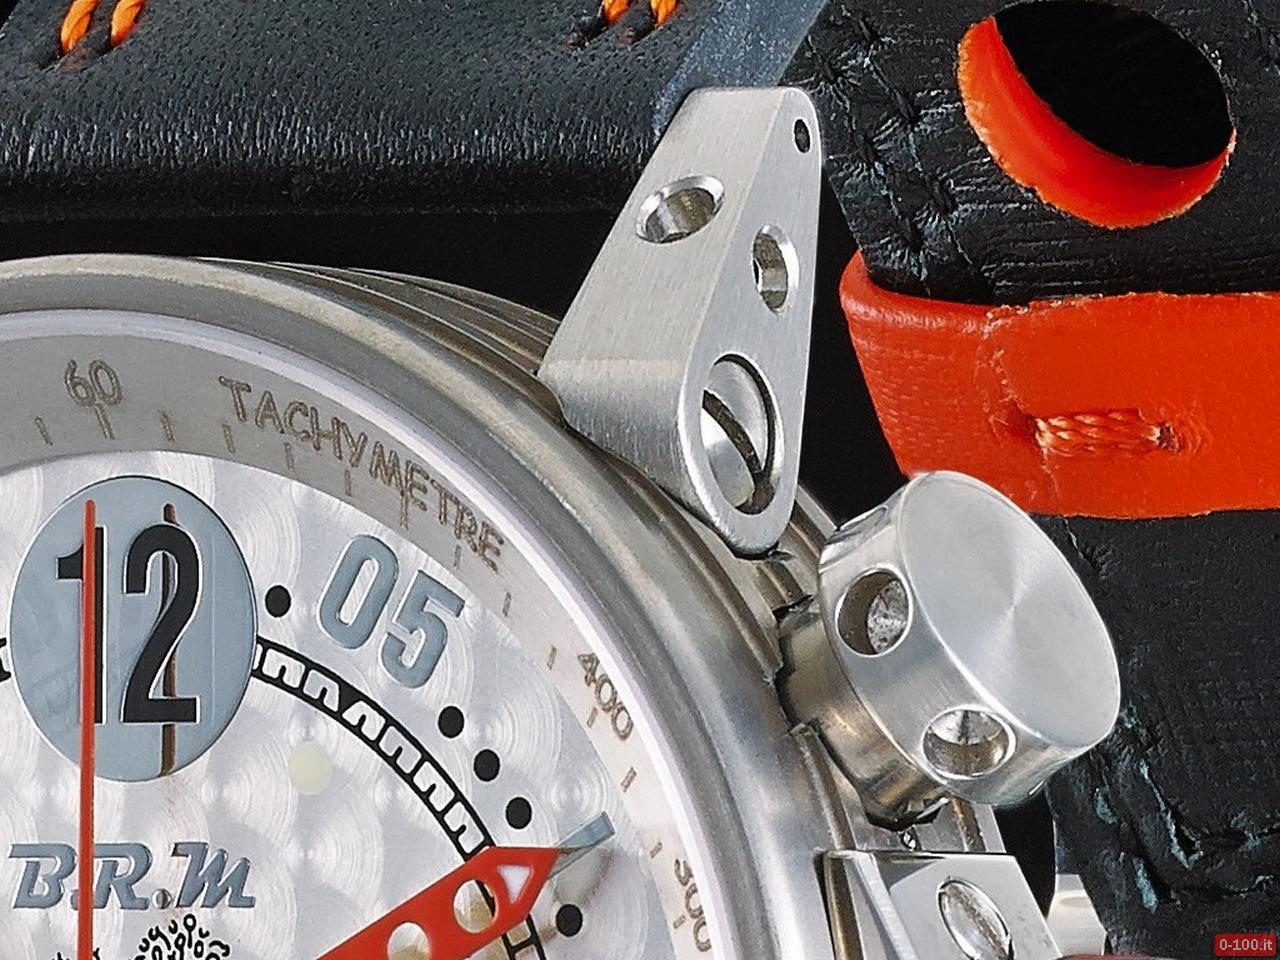 brm-v12-44-rallye-maroc-classic-prezzo-price-0-100_1